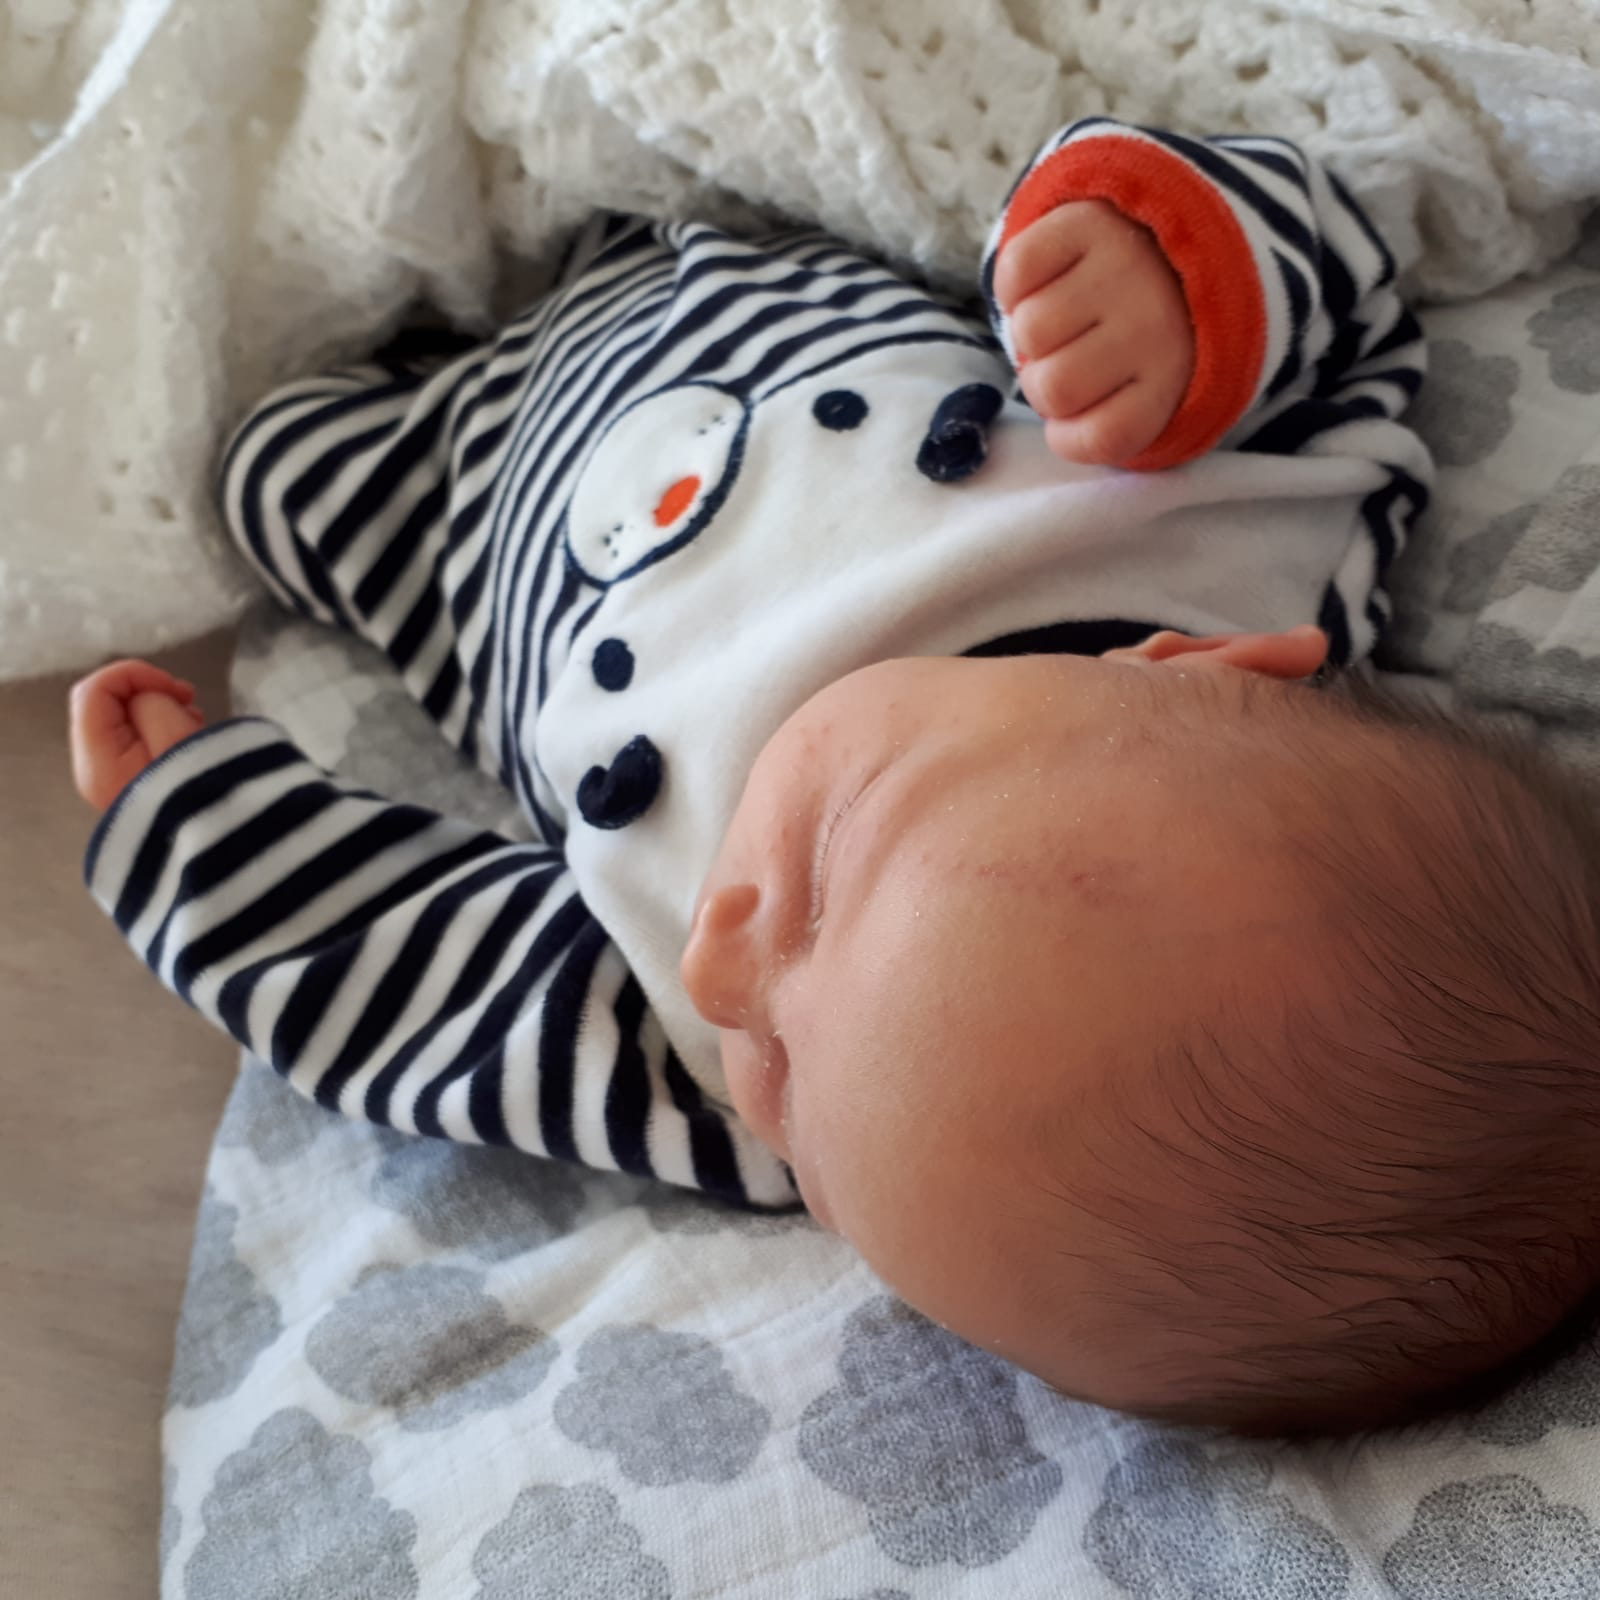 Mamamoon baby - Daphne